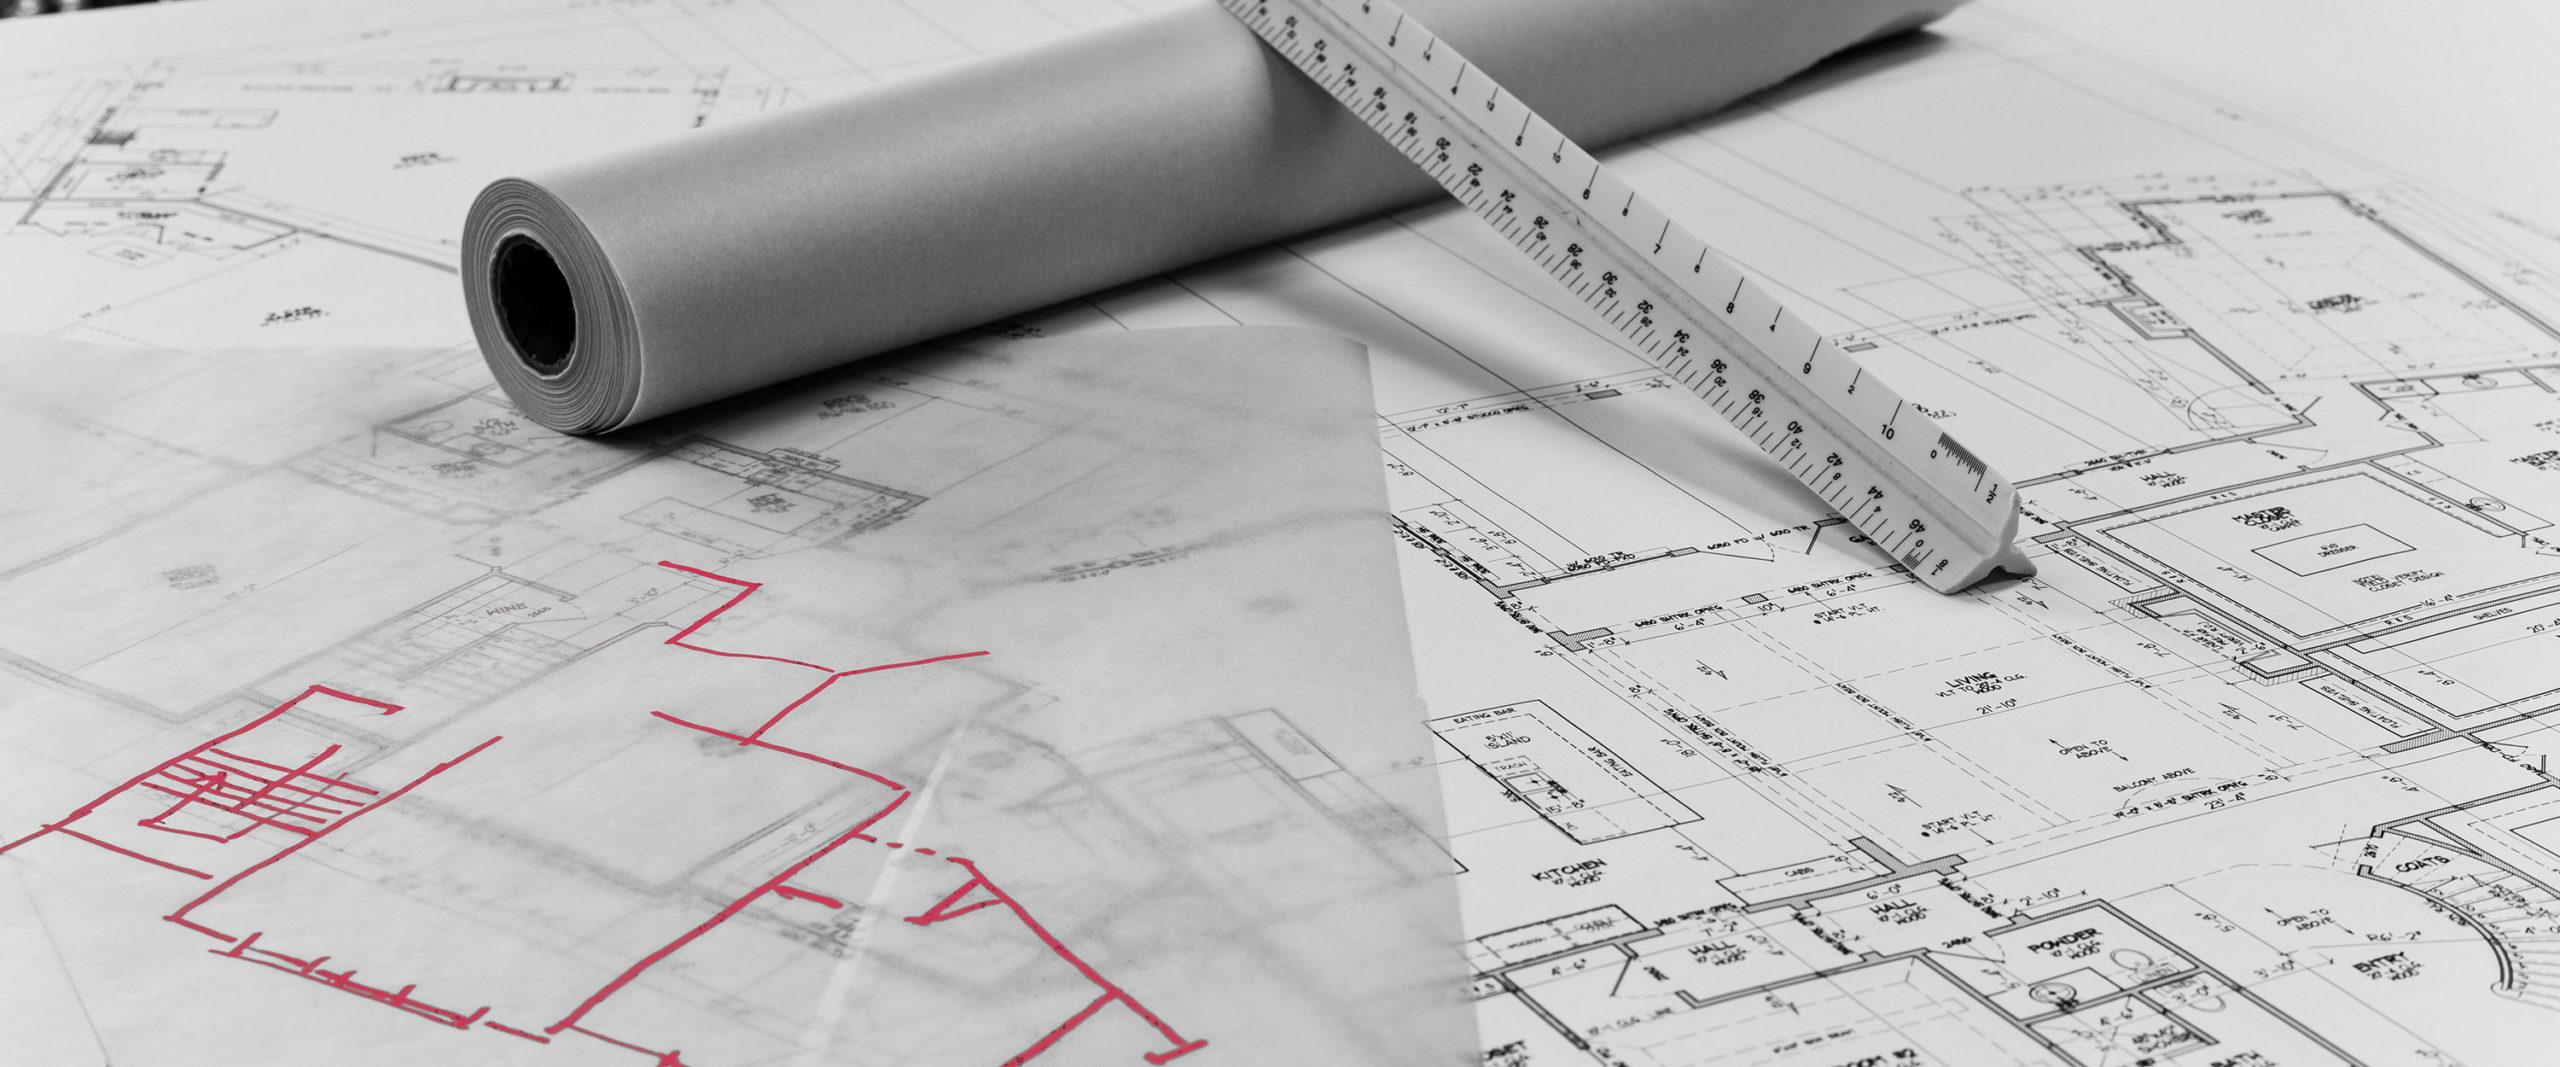 custom-design-home-process-bainbridge-design-group